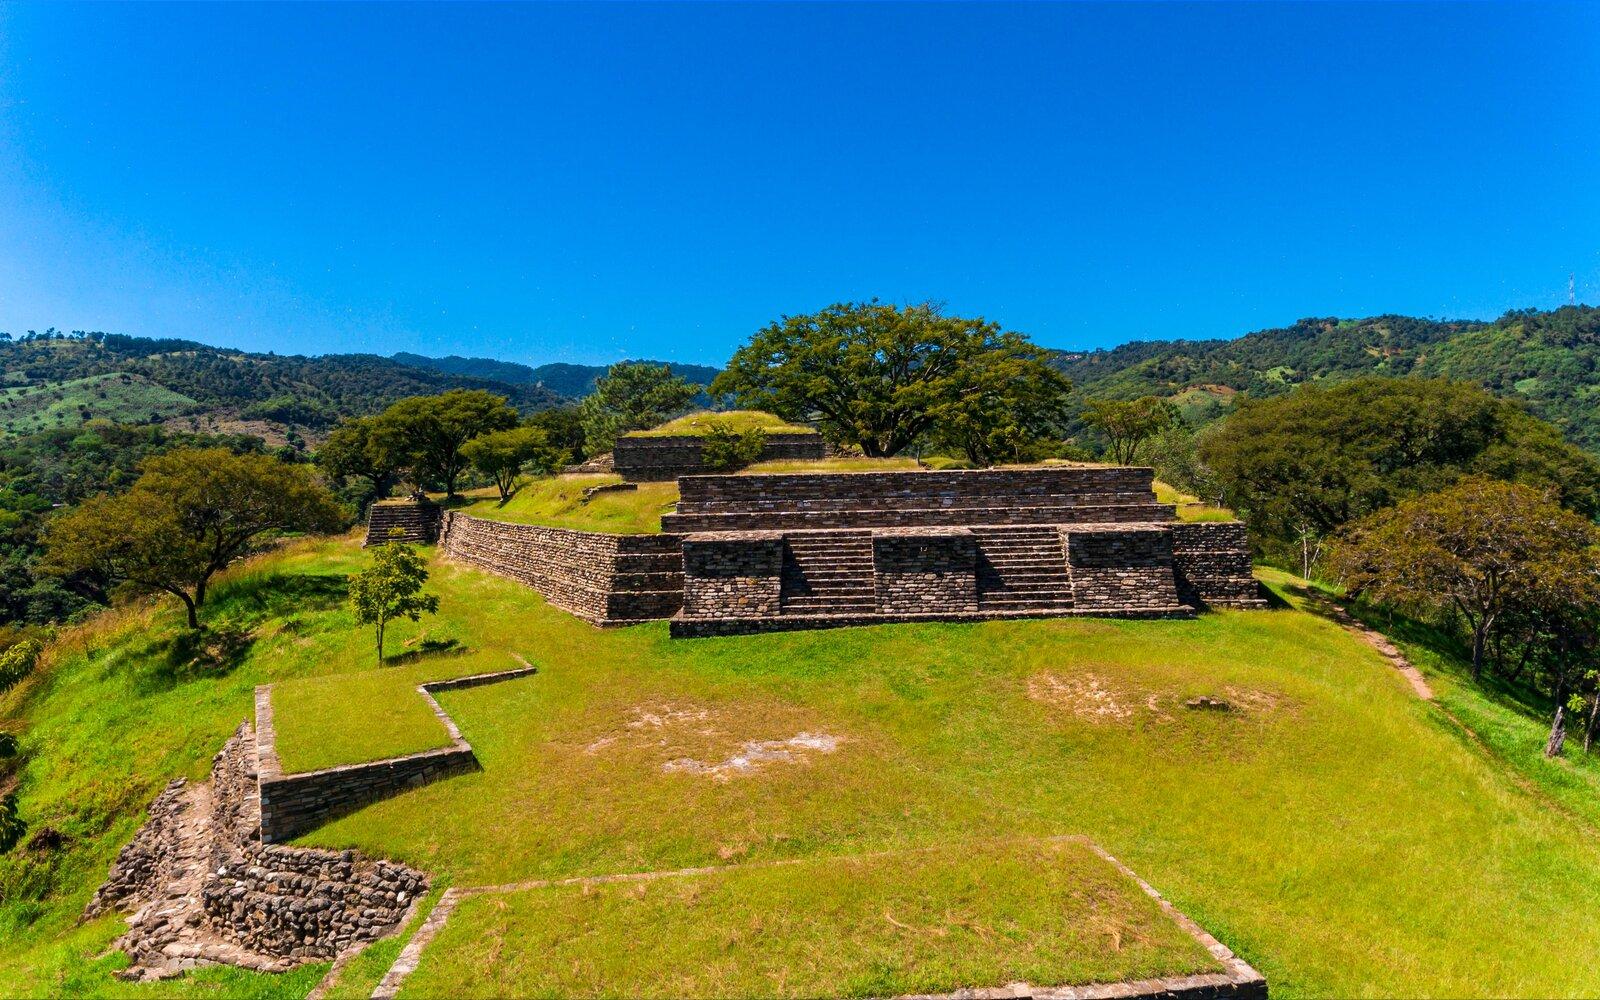 Sitio Arqueológico Mixco Viejo